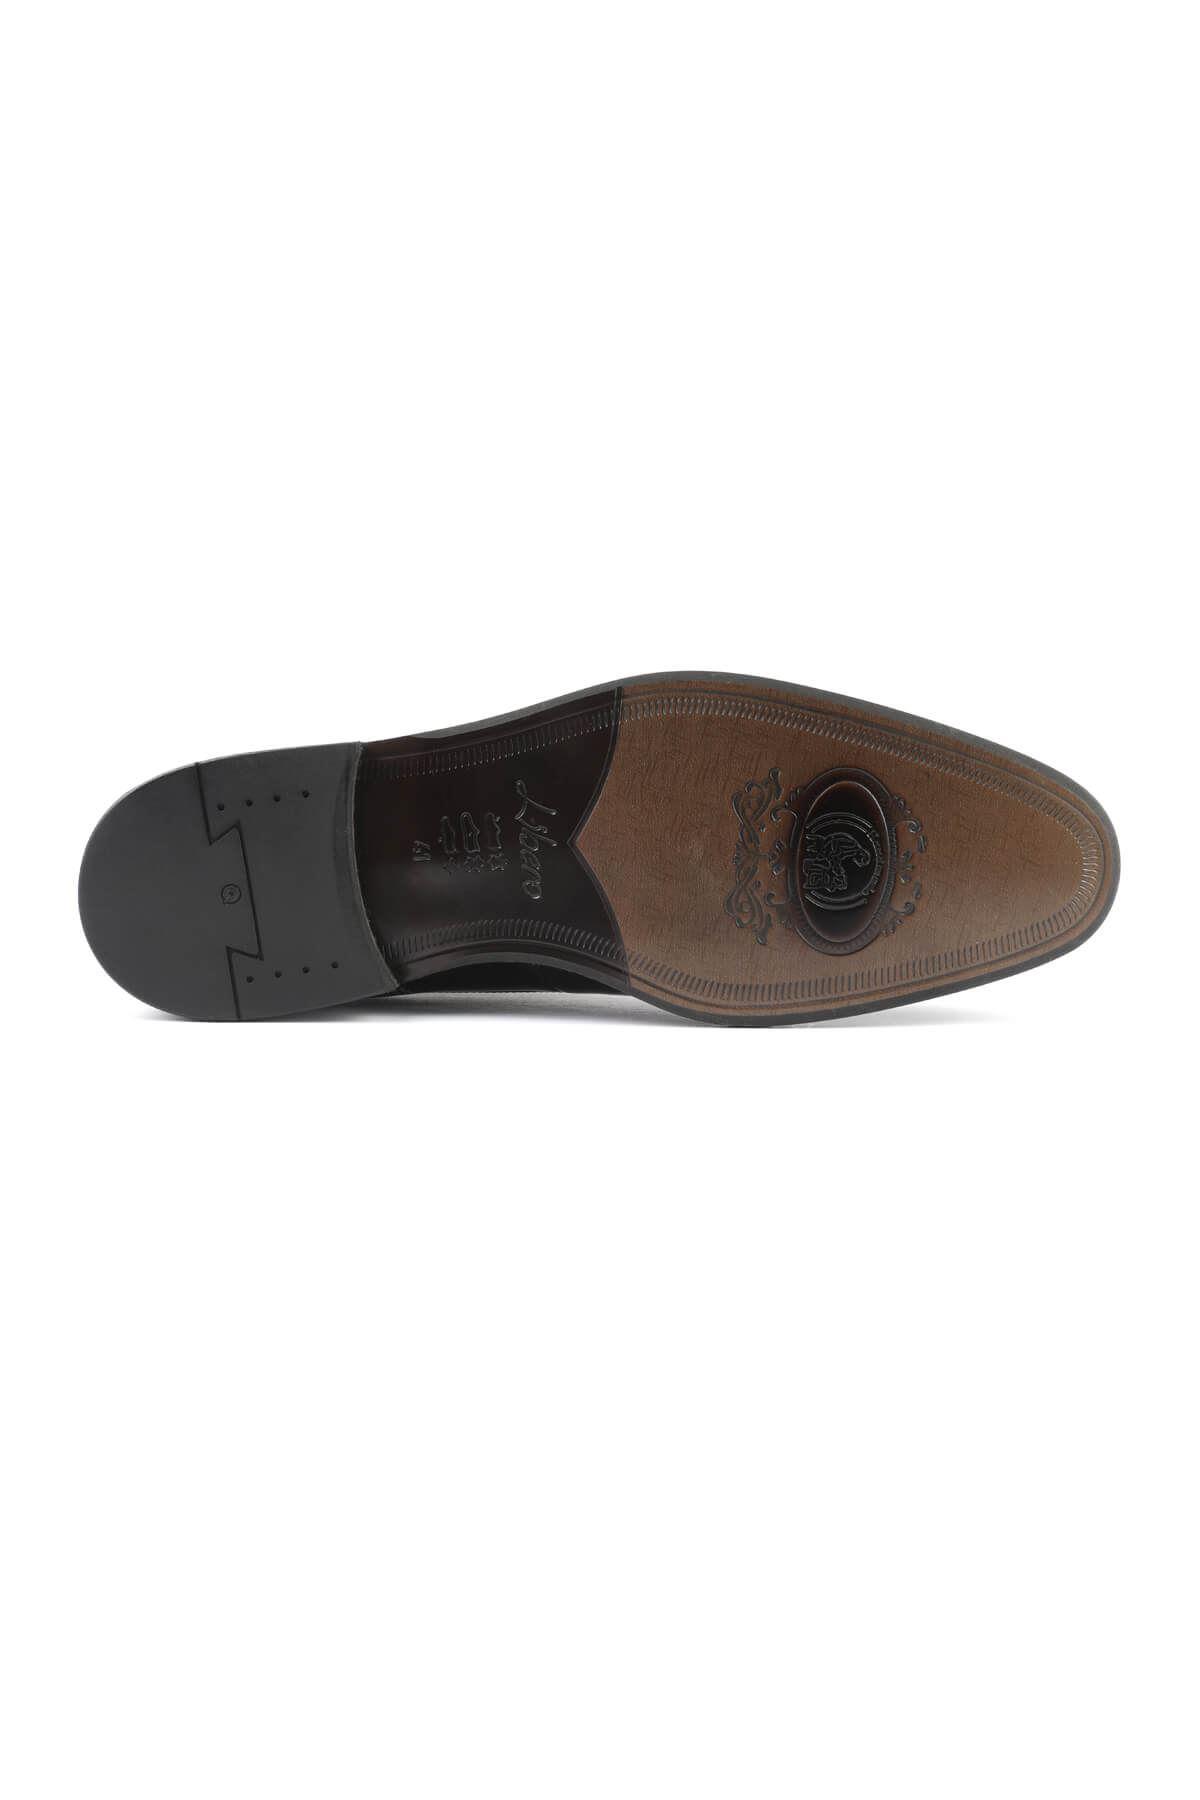 Libero T961 Siyah Klasik Ayakkabı